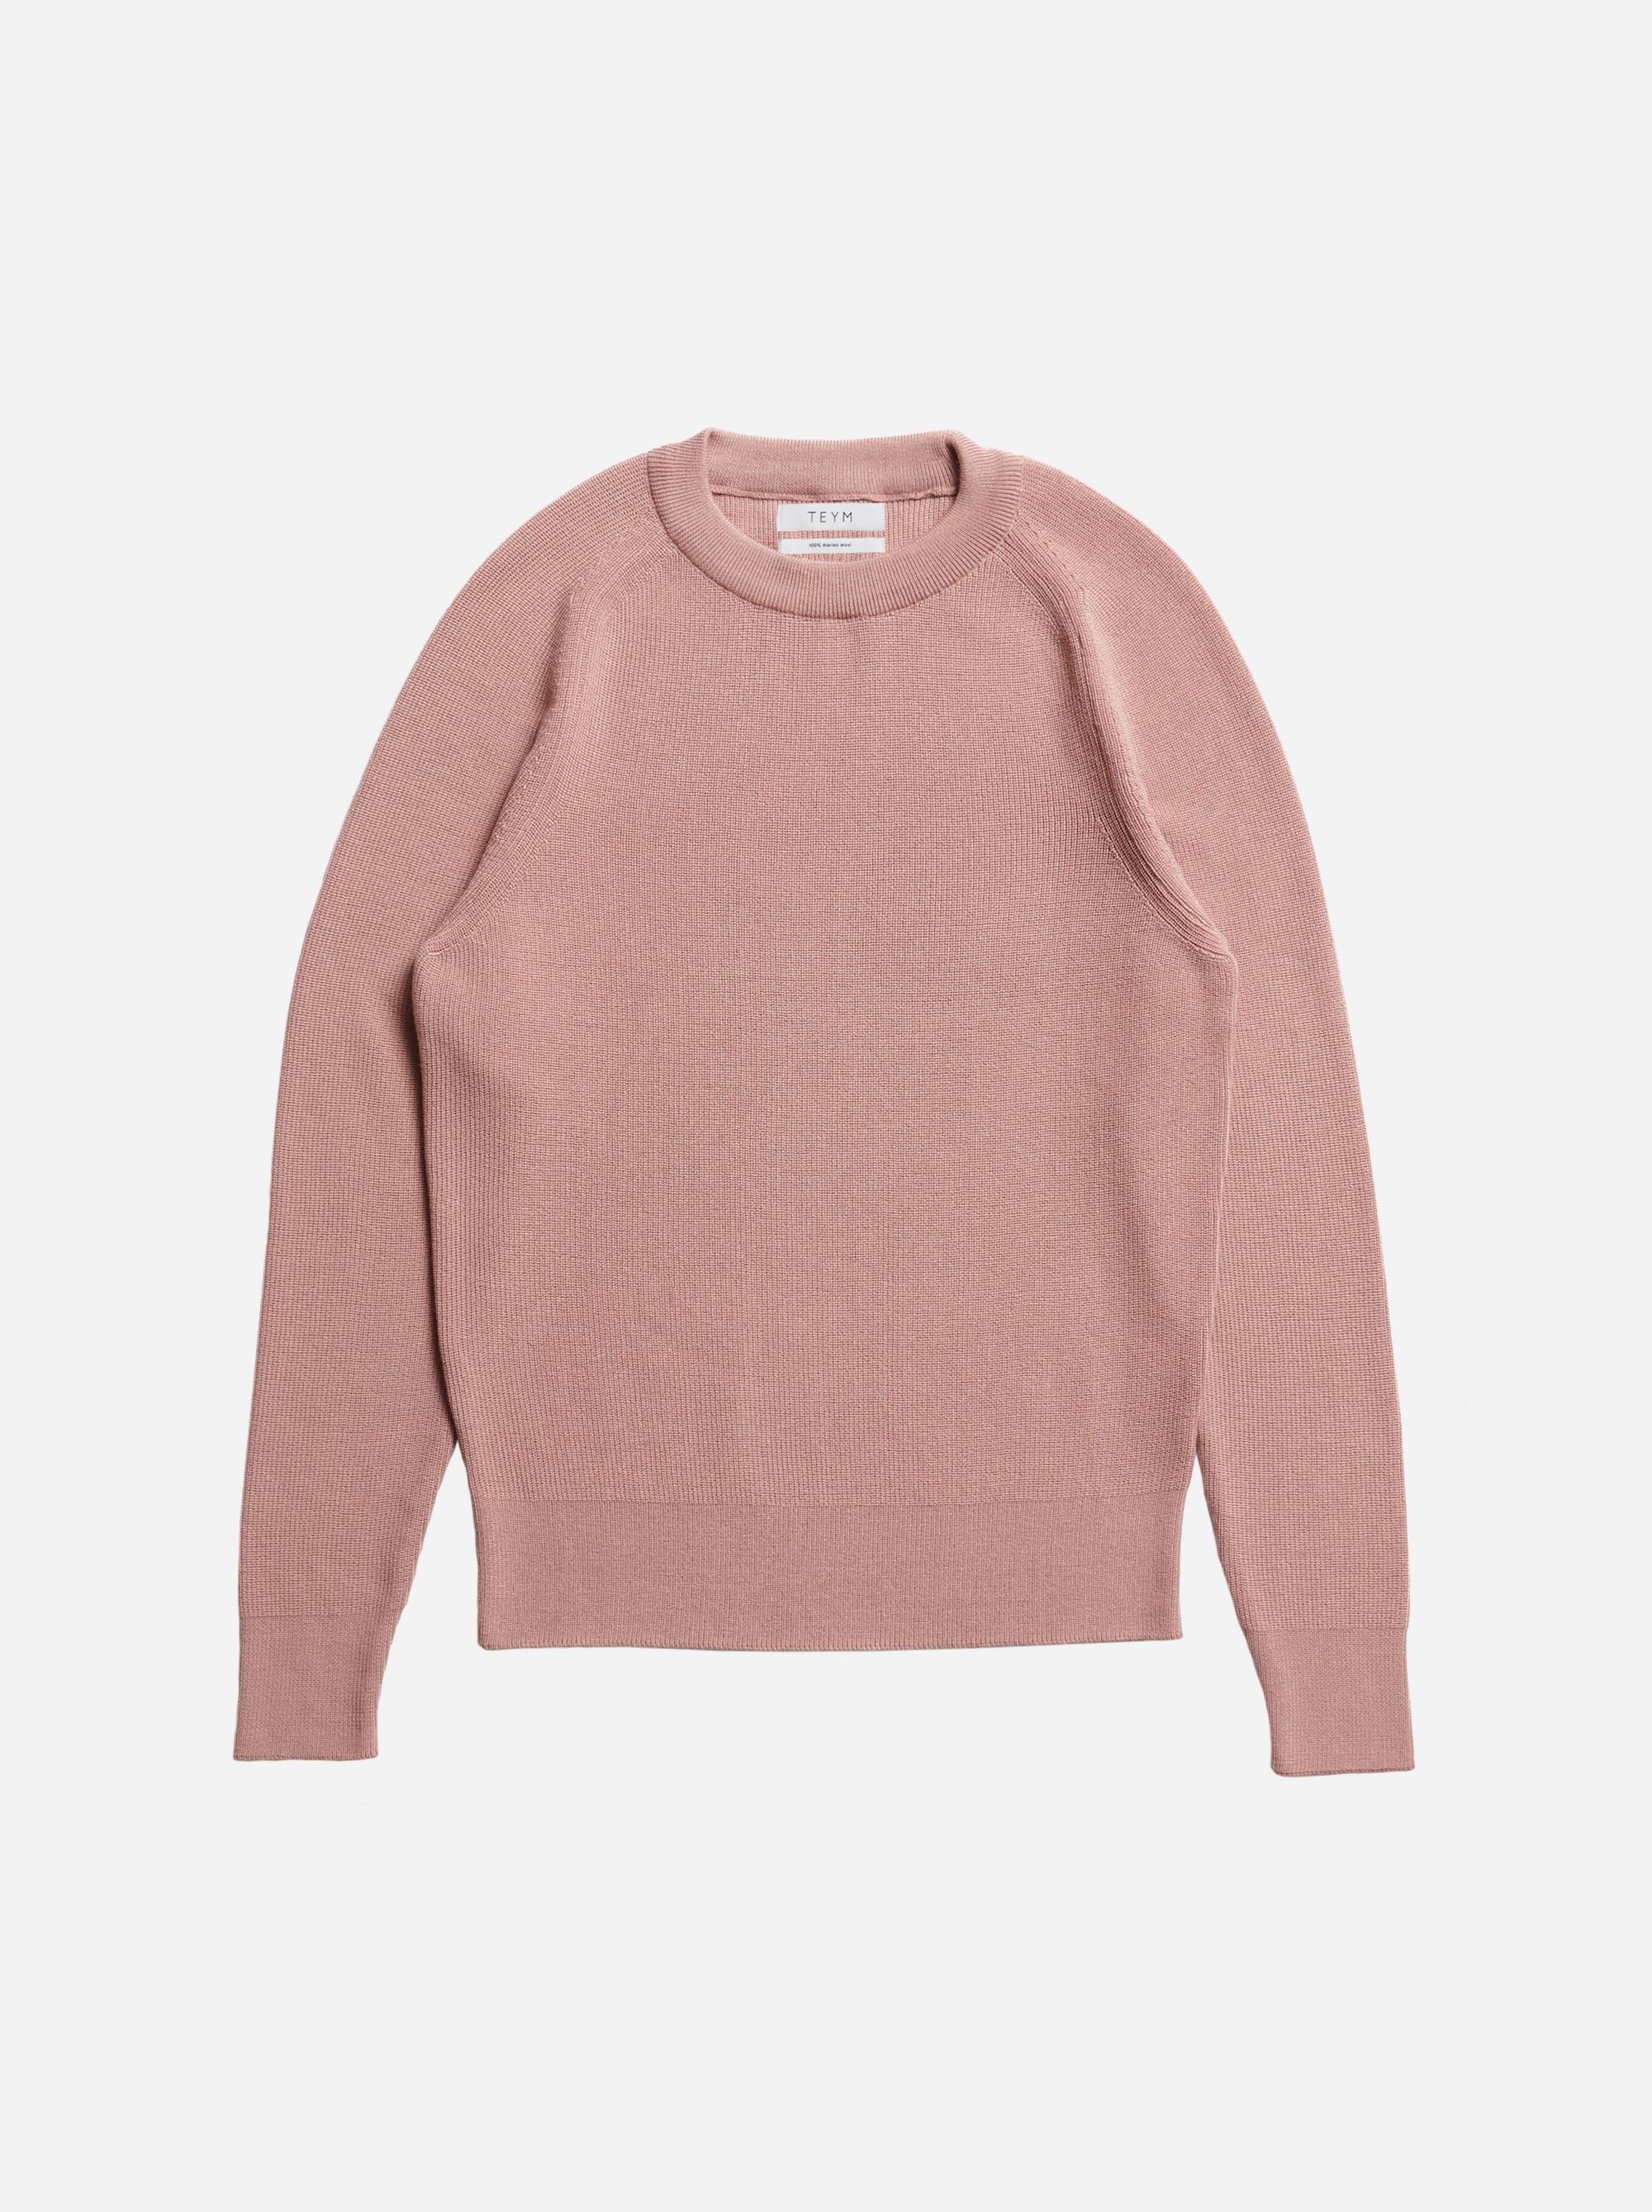 Teym - The Merino Sweater - Men - Pink - 5